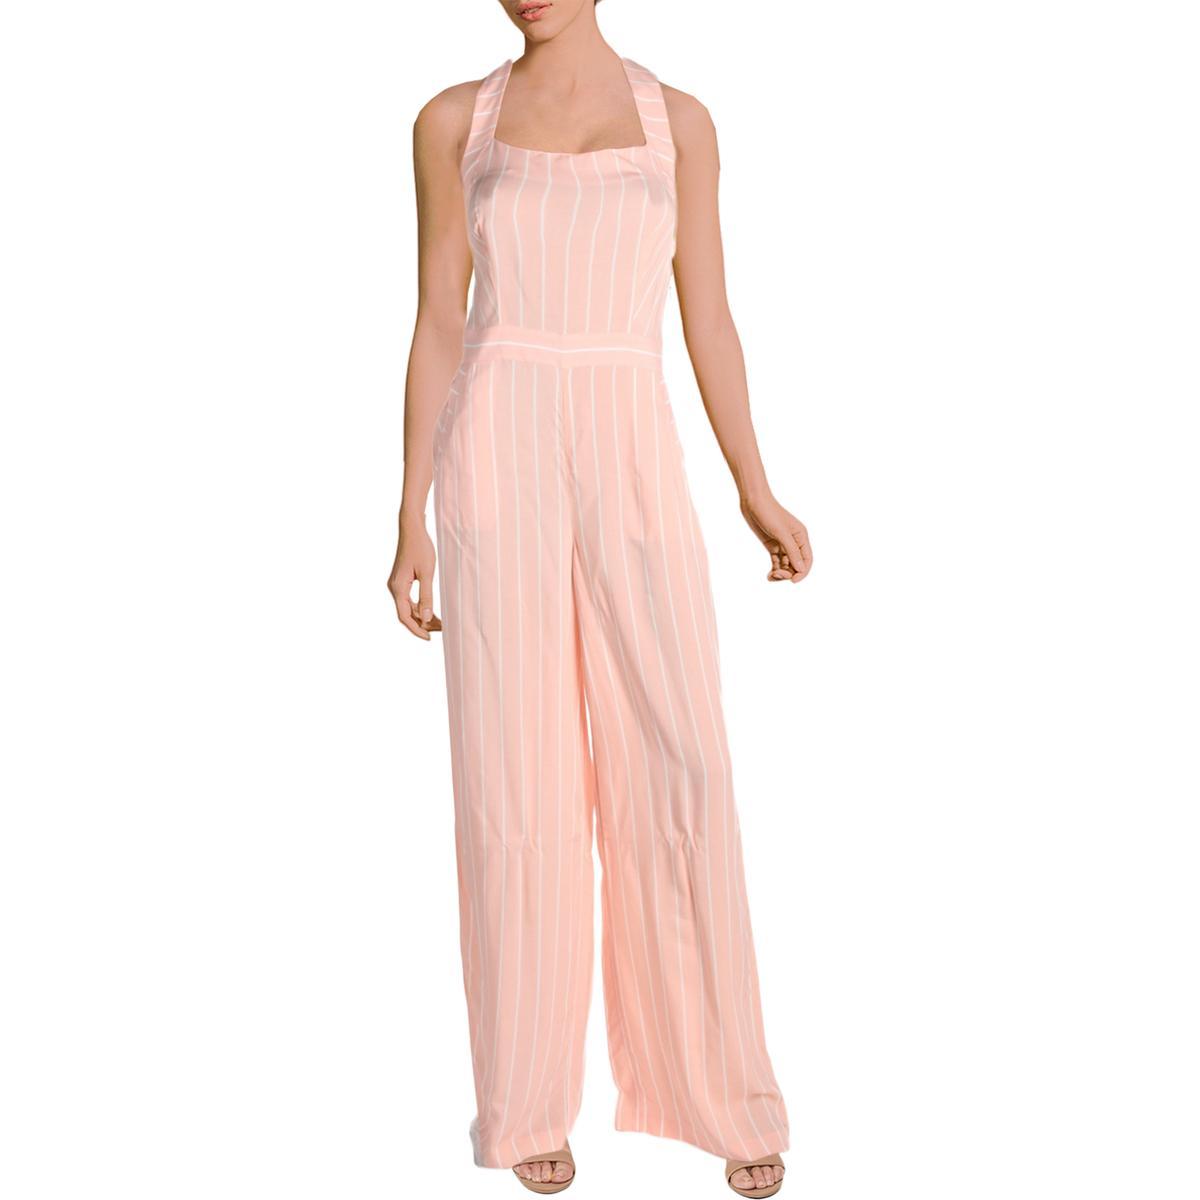 c1bea4f1fa7 Juicy Couture Black Label Womens Pink Halter Wide Leg Jumpsuit 4 ...